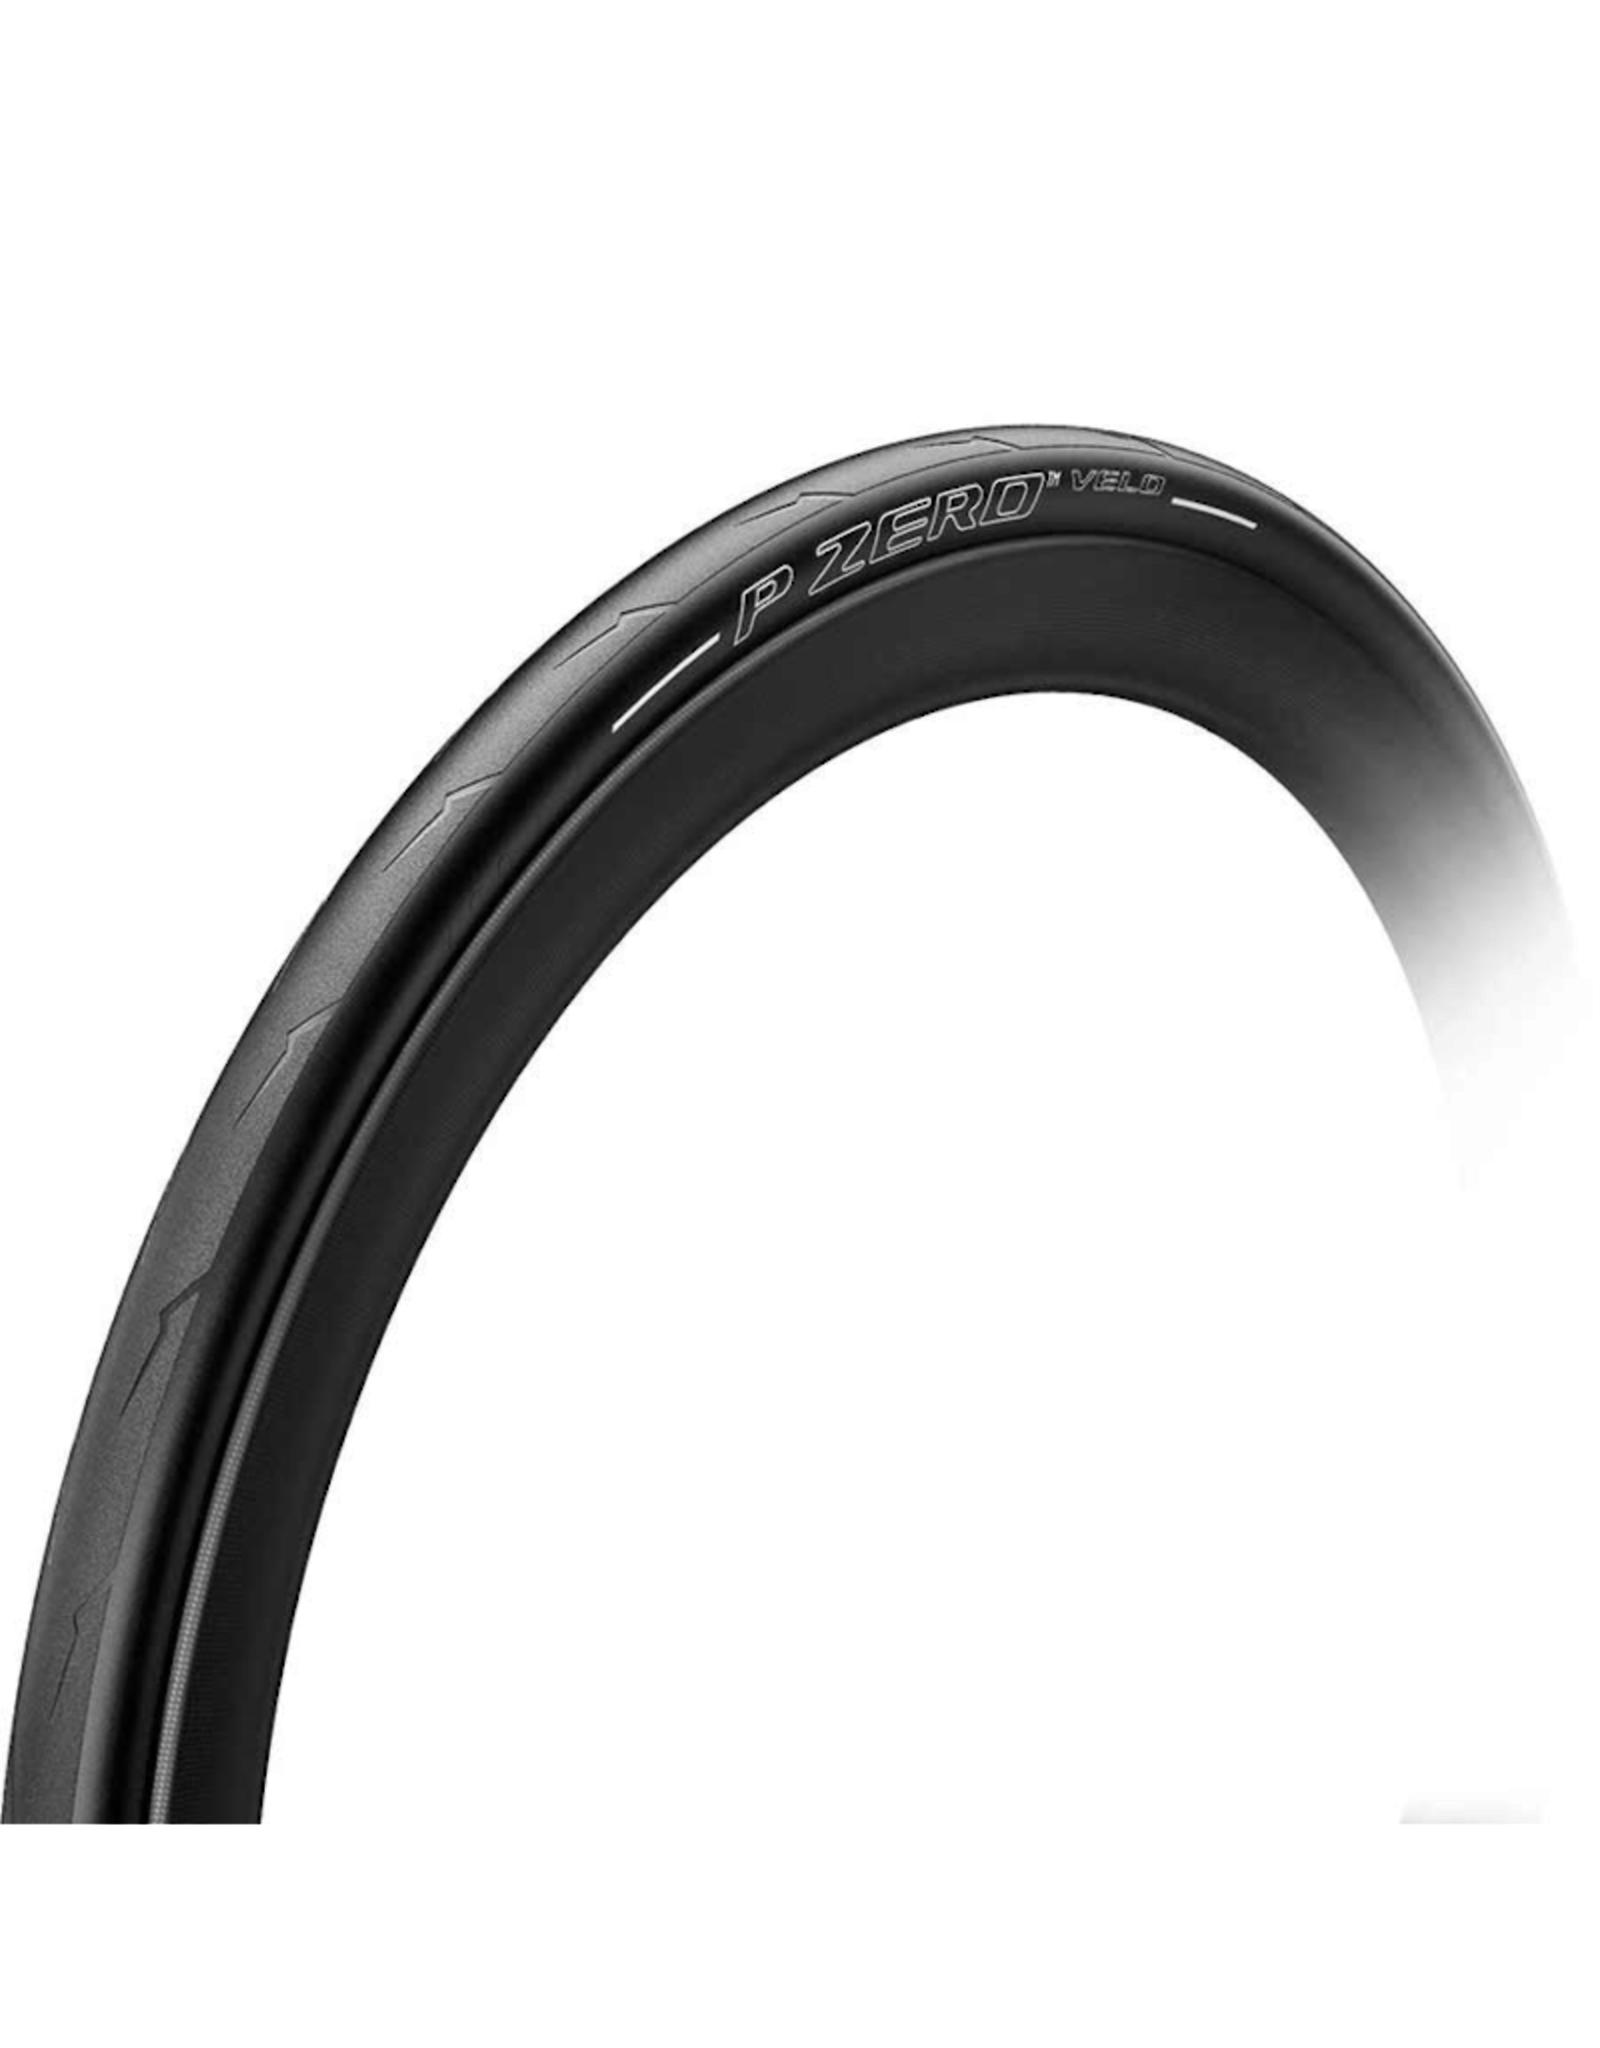 Pirelli Pirelli, PZero Velo, 700x28C, Pliable, Smartnet Silica, Aramid Fiber, 127TPI, 230g, Noir